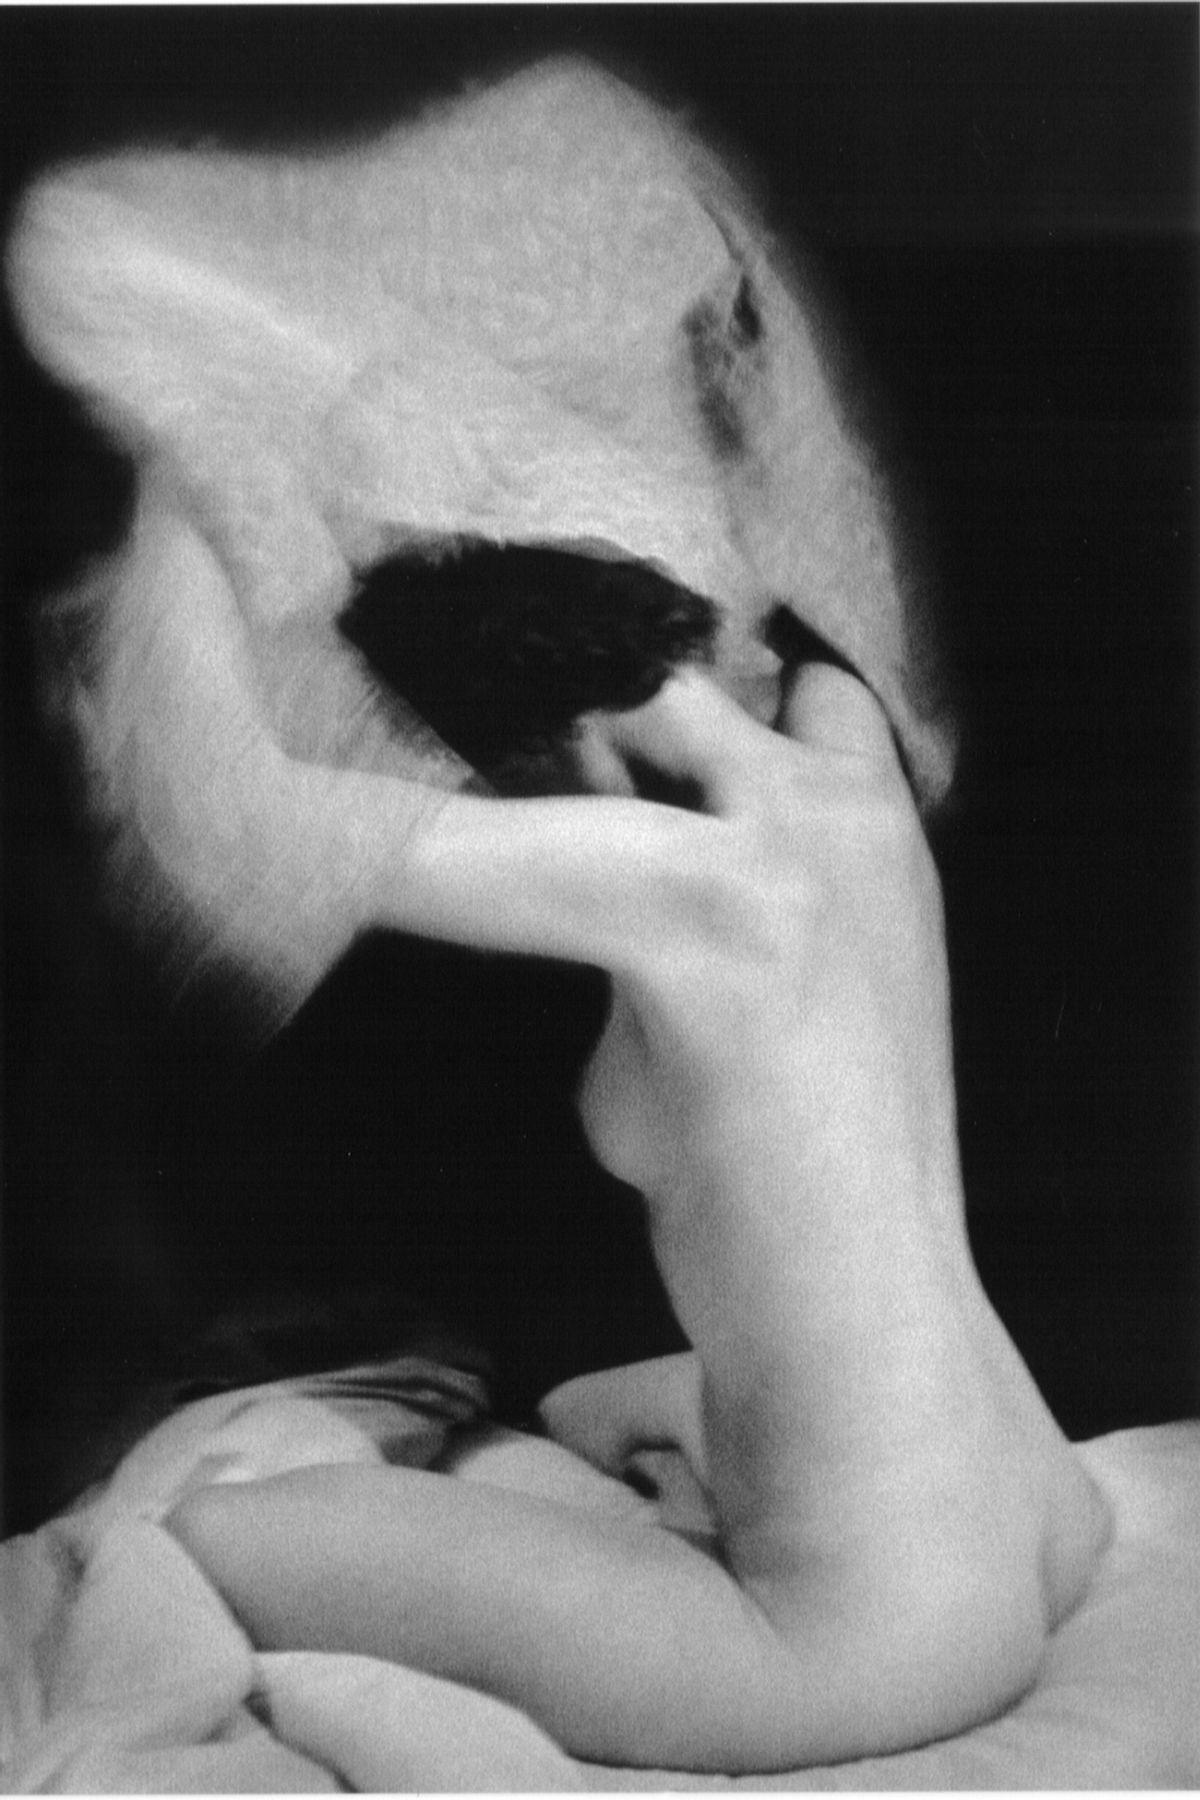 René Groebli: Auge Der Liebe (Eye of Love), #521, 1952, 85 x 56 cm, Ed. 7